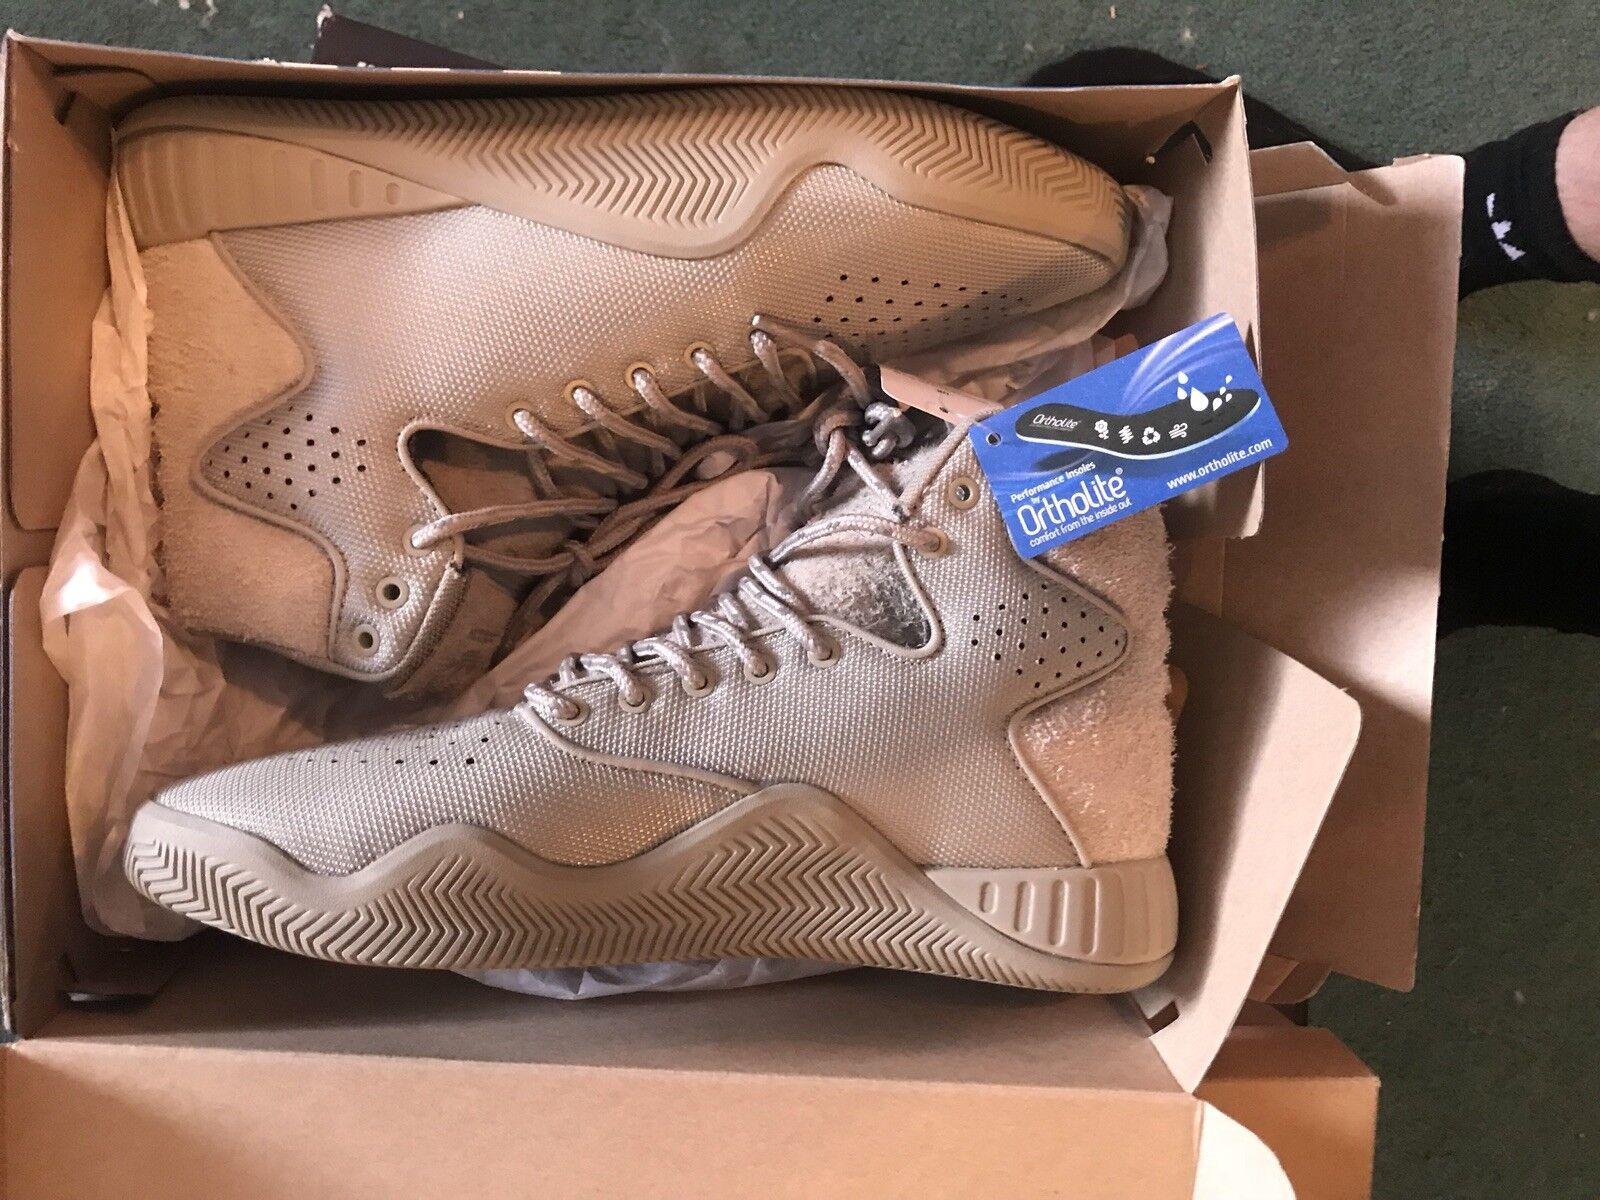 Adidas Tubular BB2386 Mens High Top shoes Desert Green US 9.5  3 New